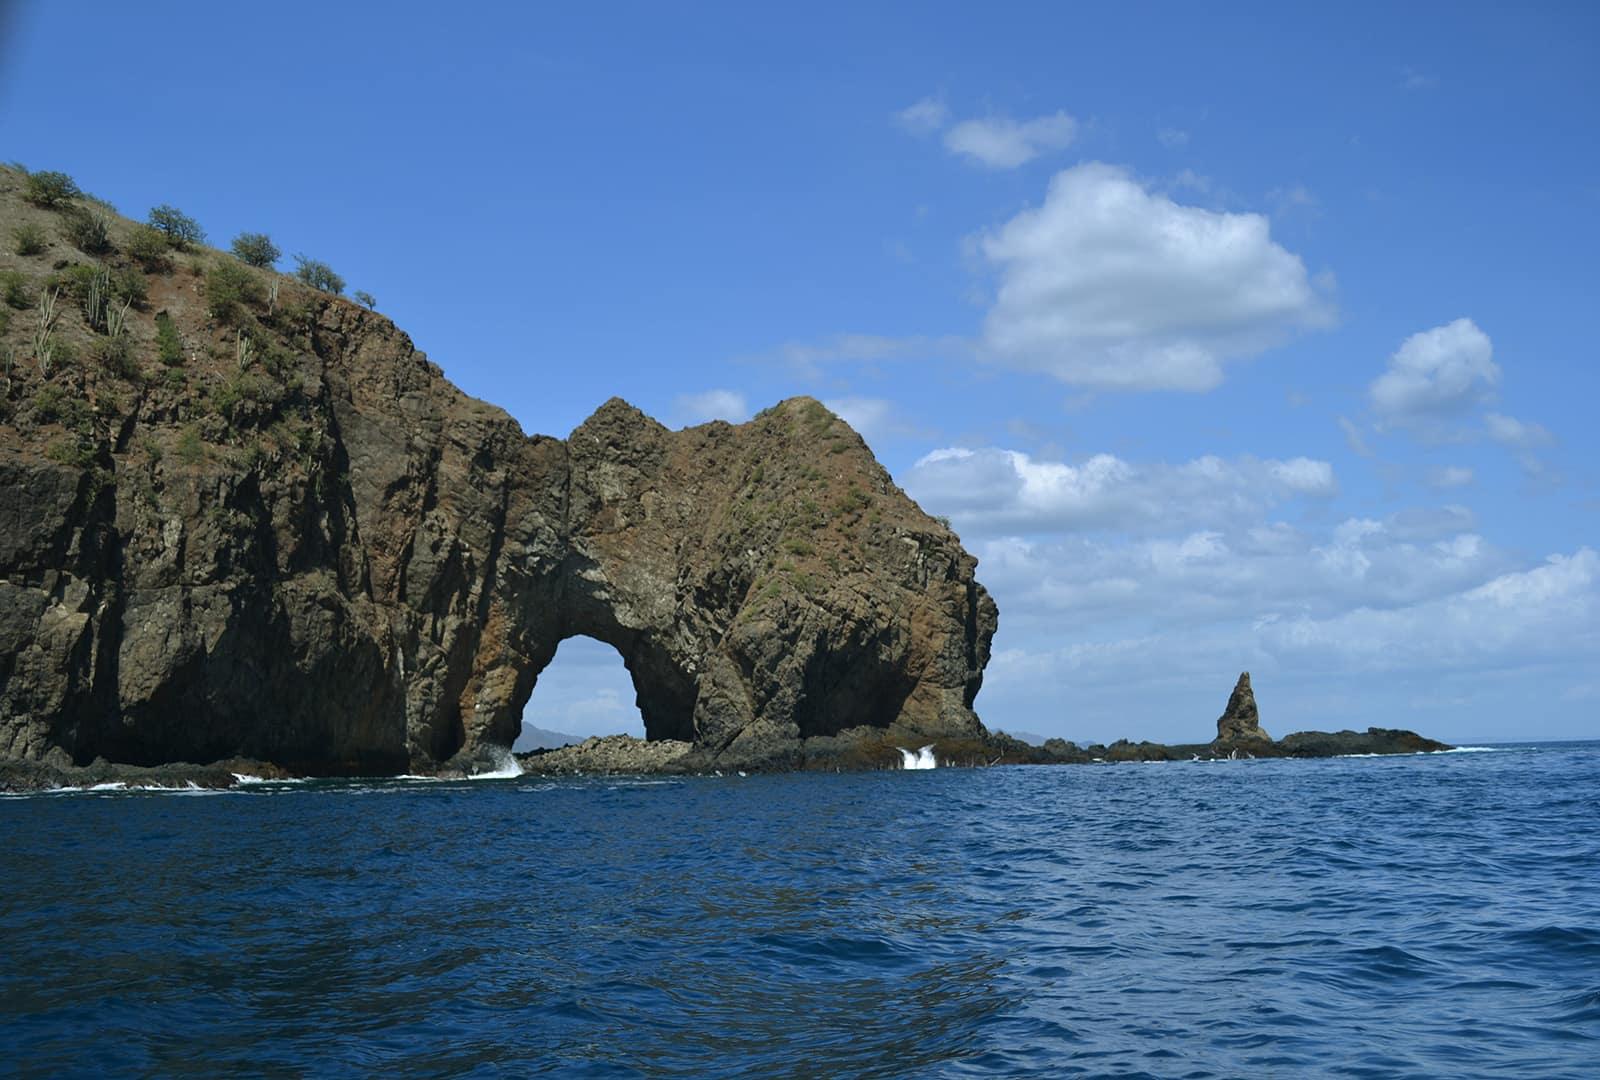 richesse-geologique-guanacaste-costa-rica-decouverte